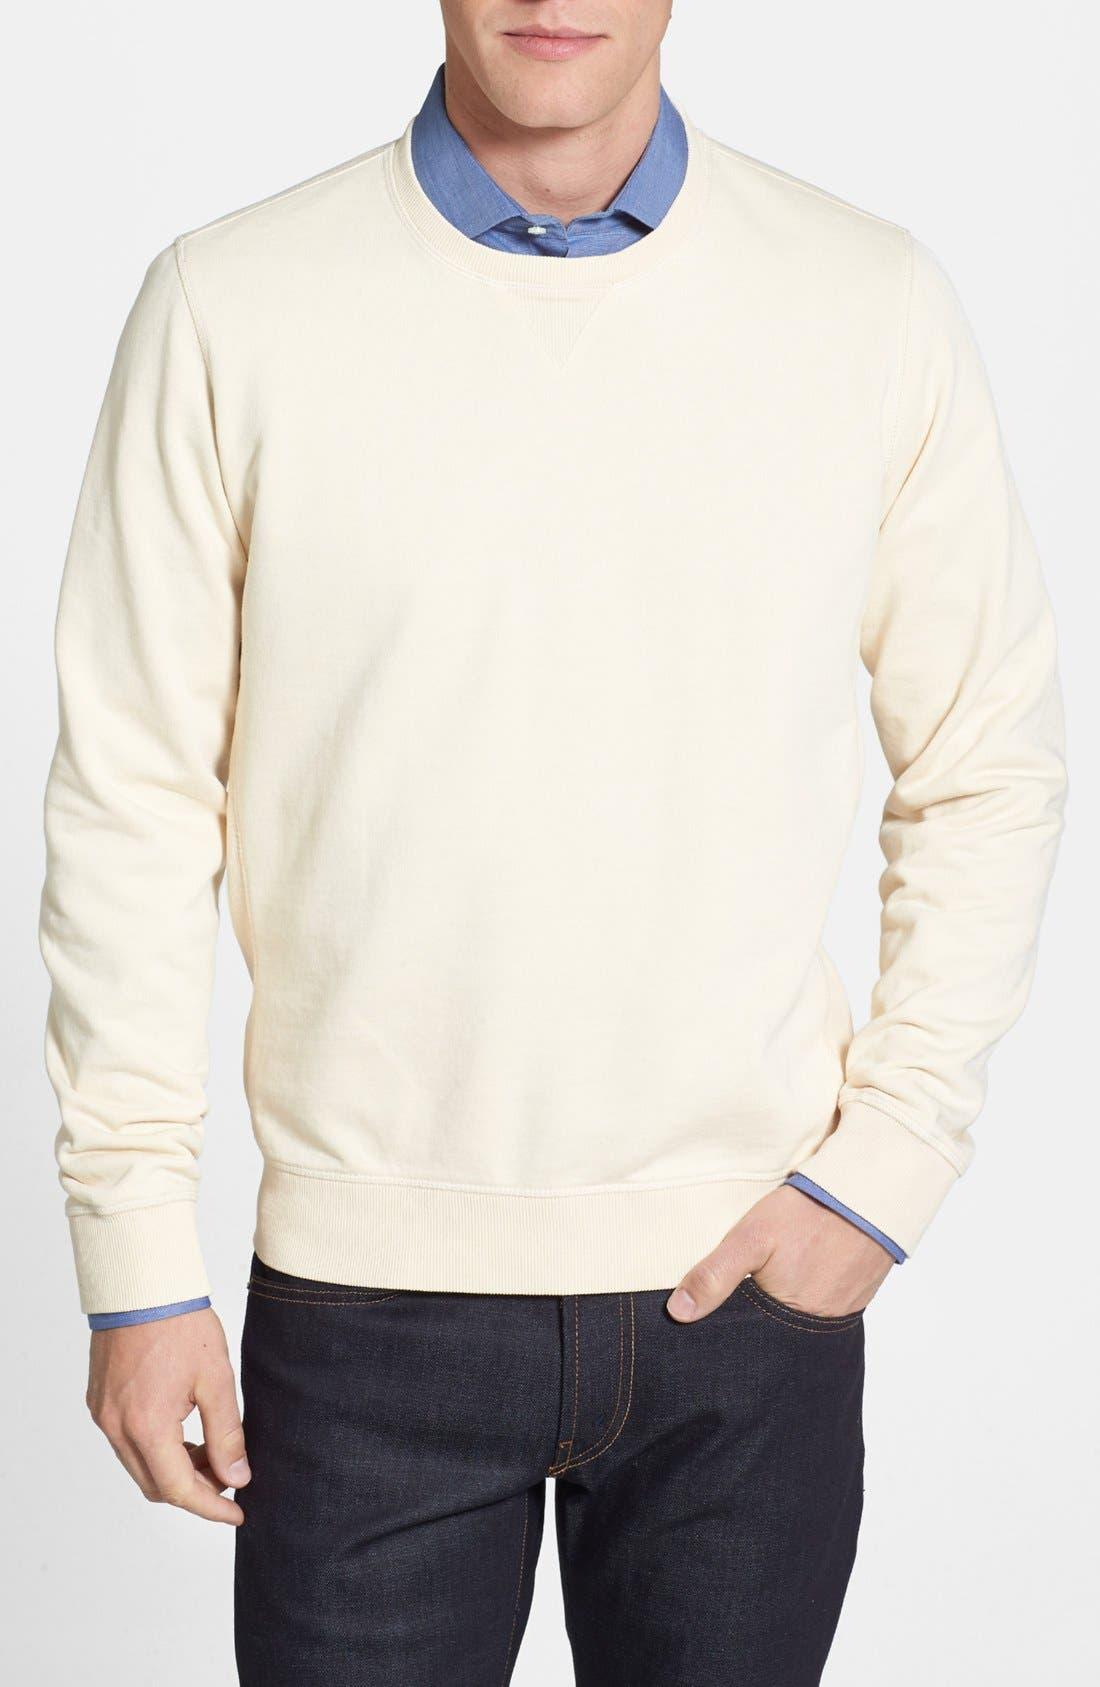 Alternate Image 1 Selected - AG French Terry Crewneck Sweatshirt